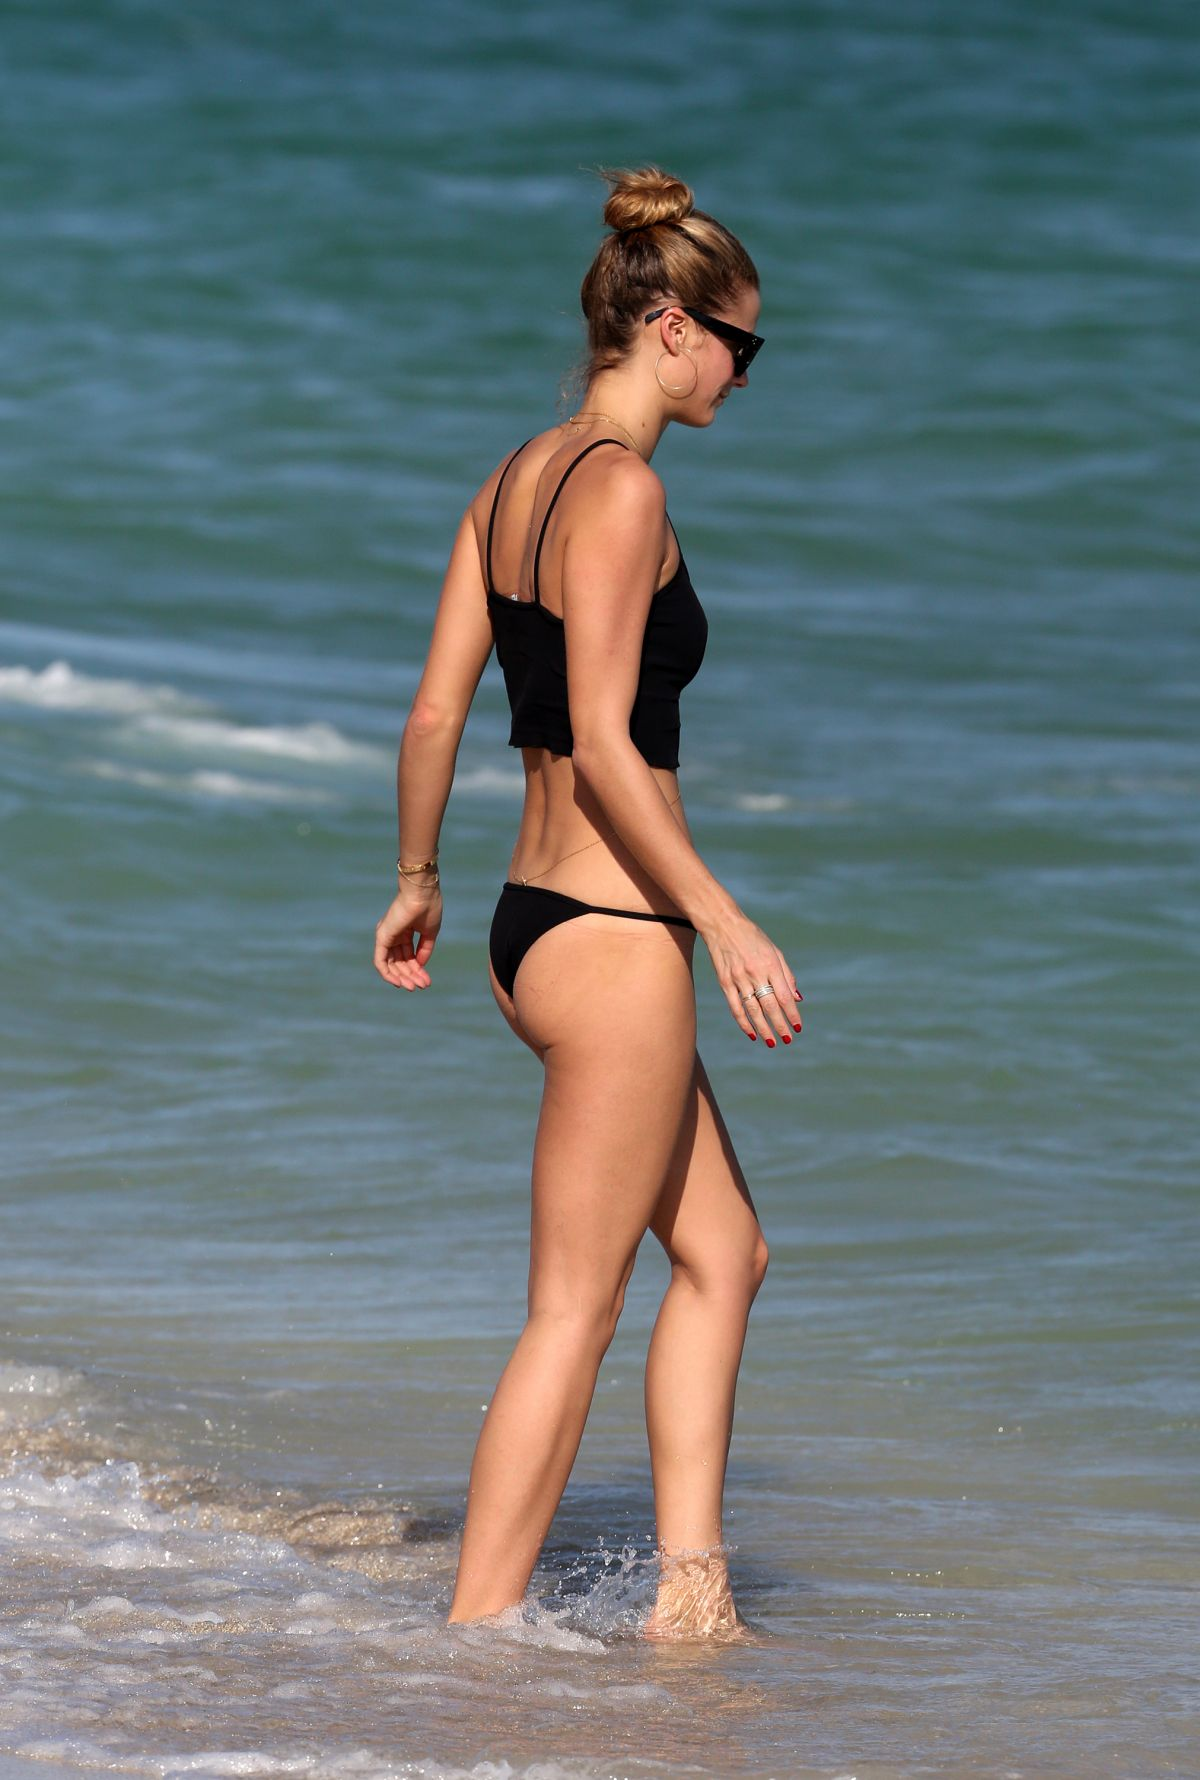 Kate Bock Bikini candids at the beach in Miami Beach Pic 12 of 35